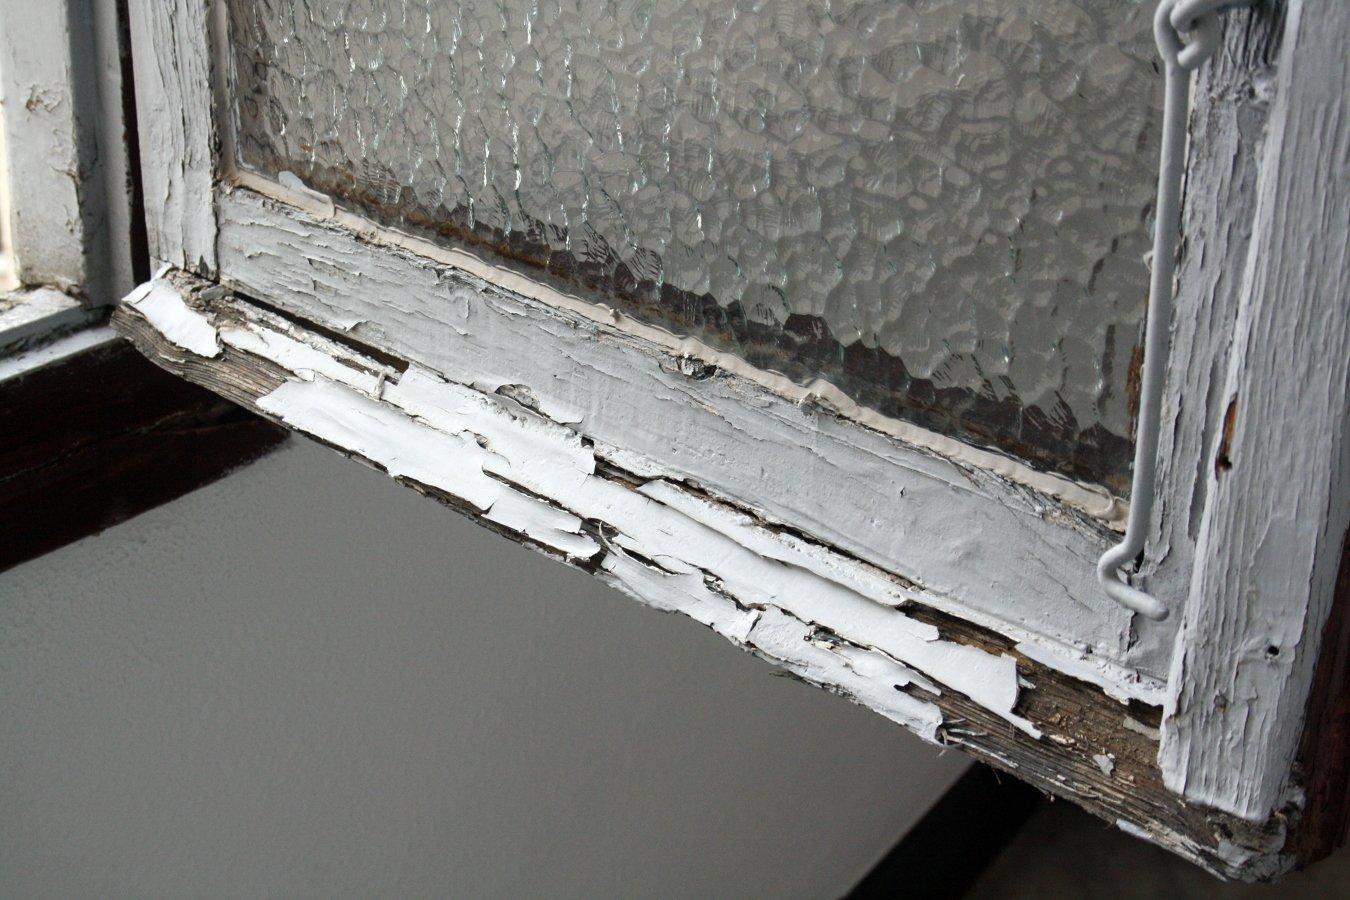 Reparar ventanas de madera zaragoza zaragoza habitissimo - Reparar madera ...